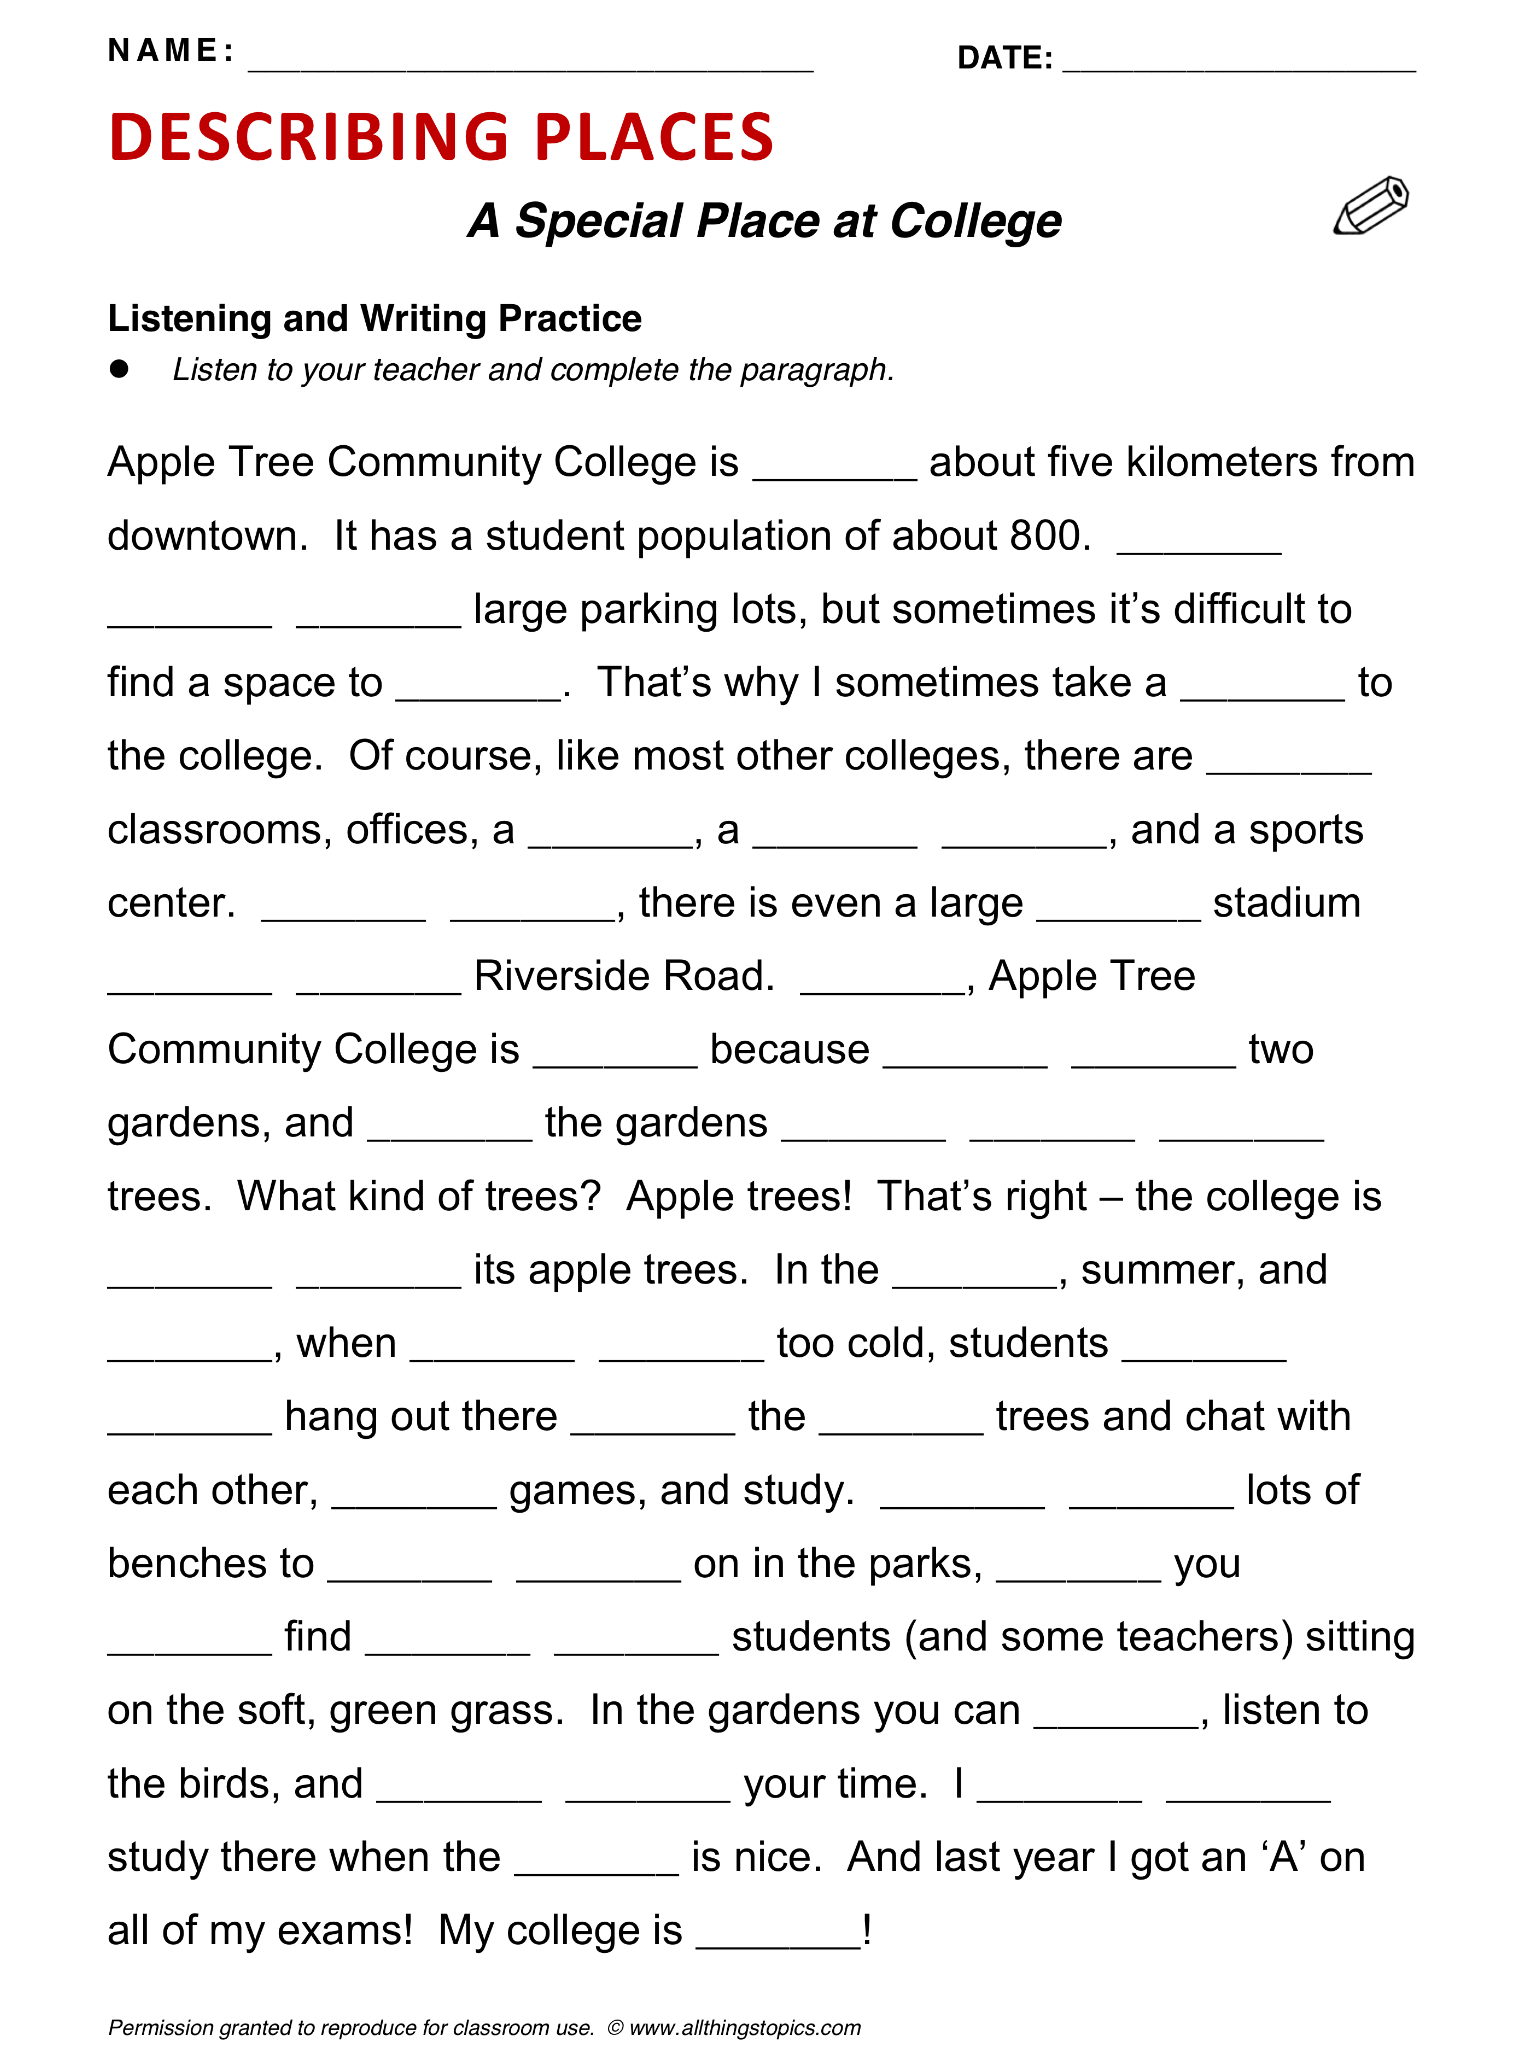 School English Learning English Vocabulary Esl English Phrases Http Www Allthingst English Language Teaching English Language Learning Teaching English [ 2048 x 1536 Pixel ]